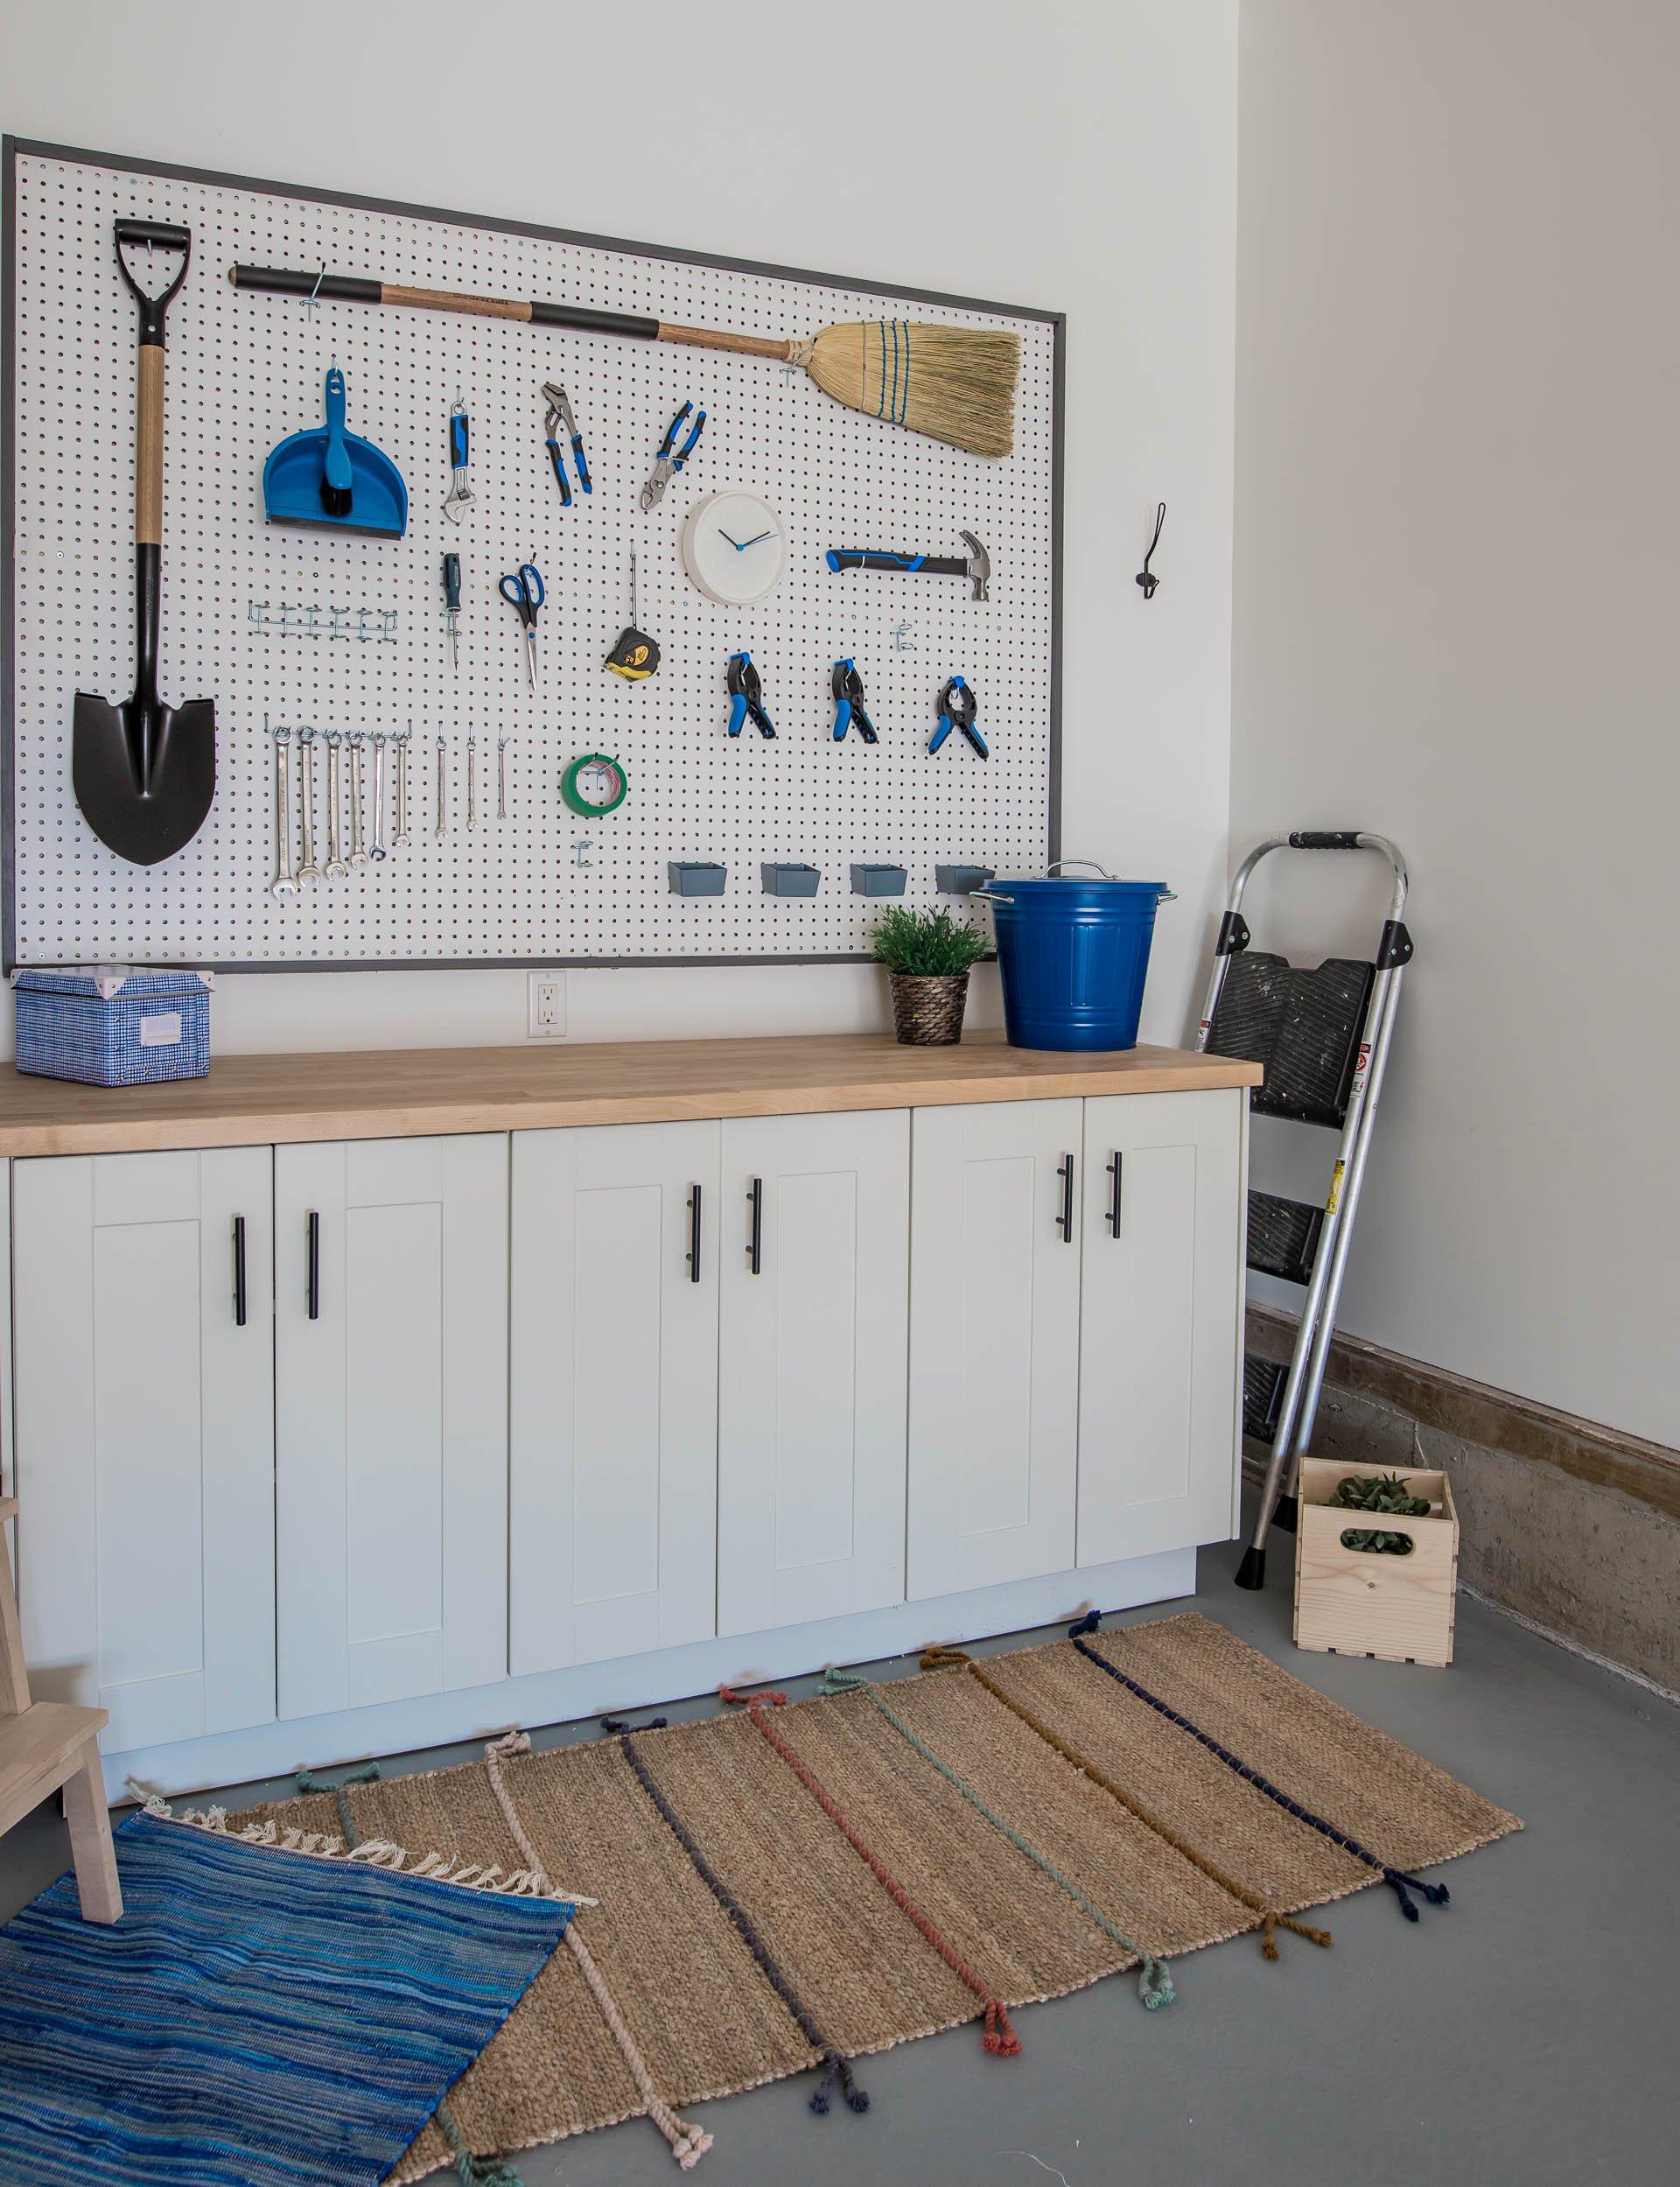 DIY Garage Work Bench and Framed Pegboard Brookfield Robson-13